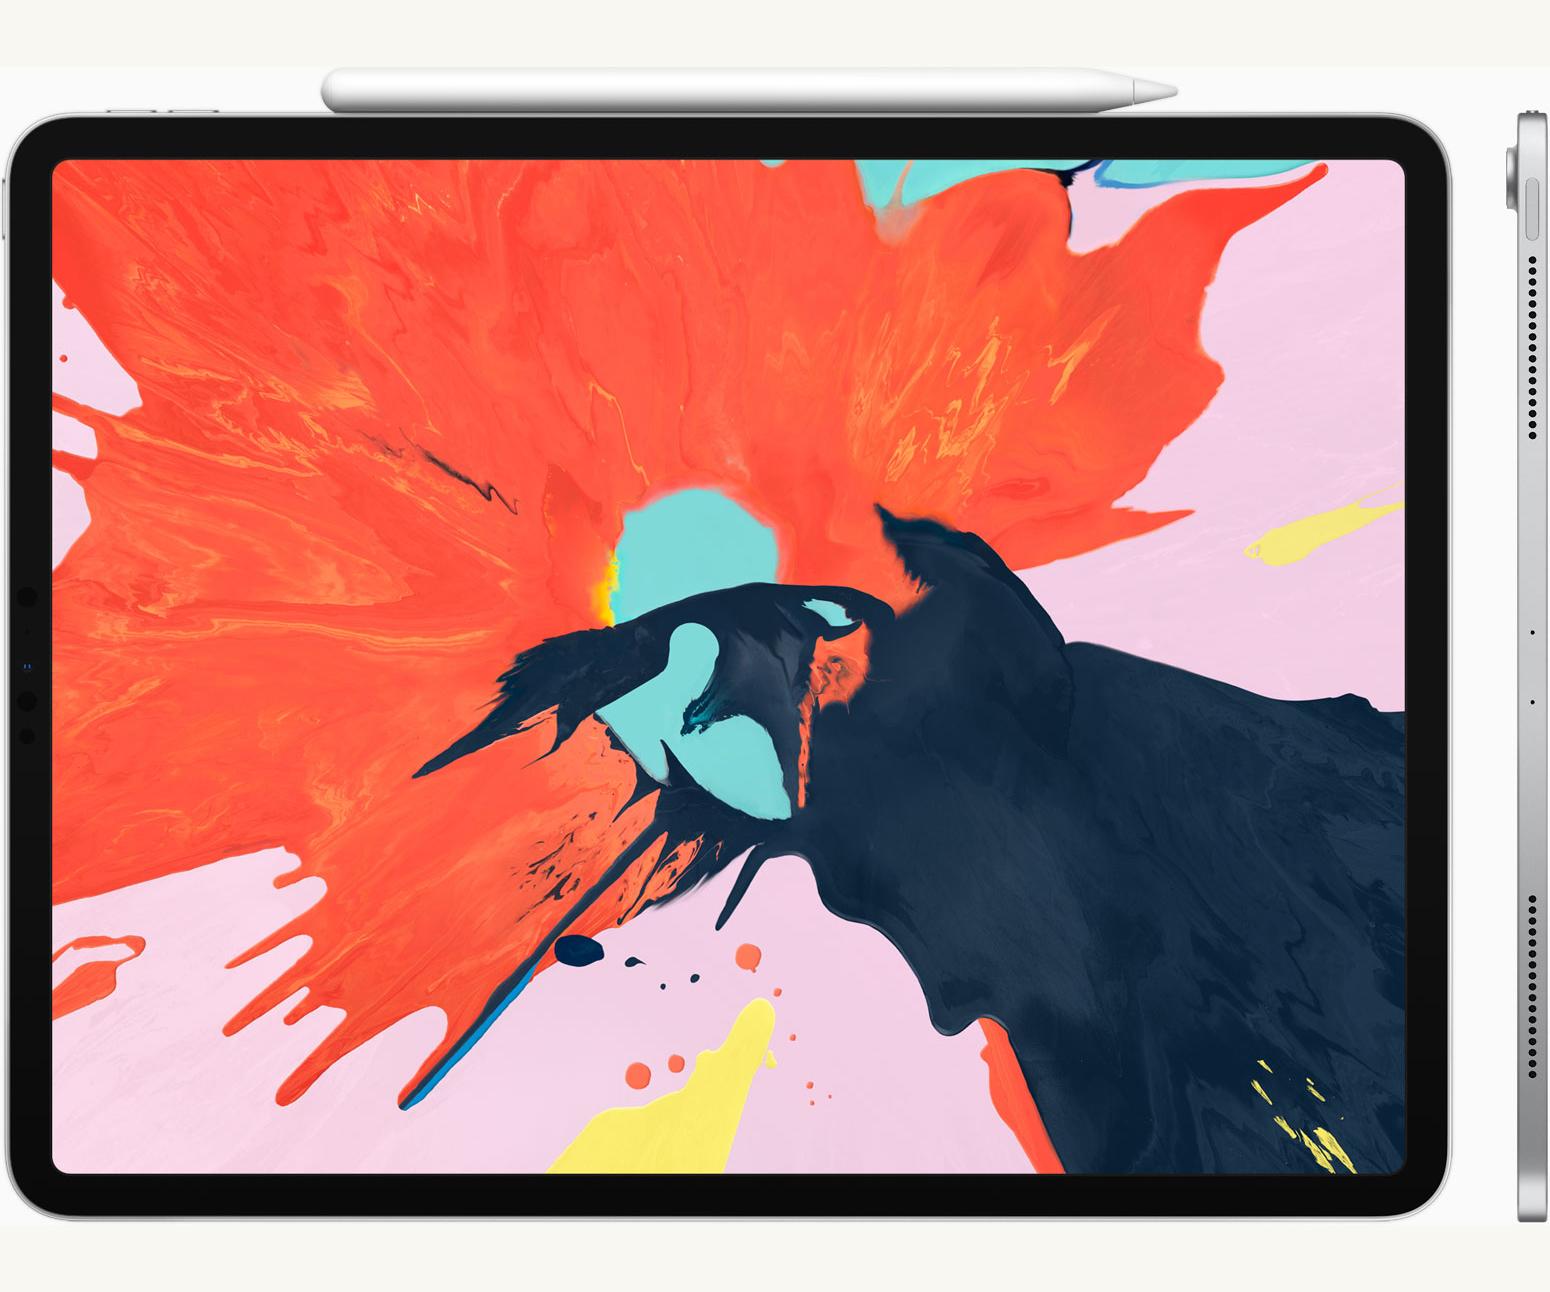 Apple iPad Pro 2018 Tablet Computer Pencil Folio Tastatur Keyboard CCT Communikation Uwe Gillner Augsburg Handy Smartphone Mobilfunk Internet Telekom Vodafone o2 Mobilcom Debitel Mnet Service Update Vertragsverlängerung